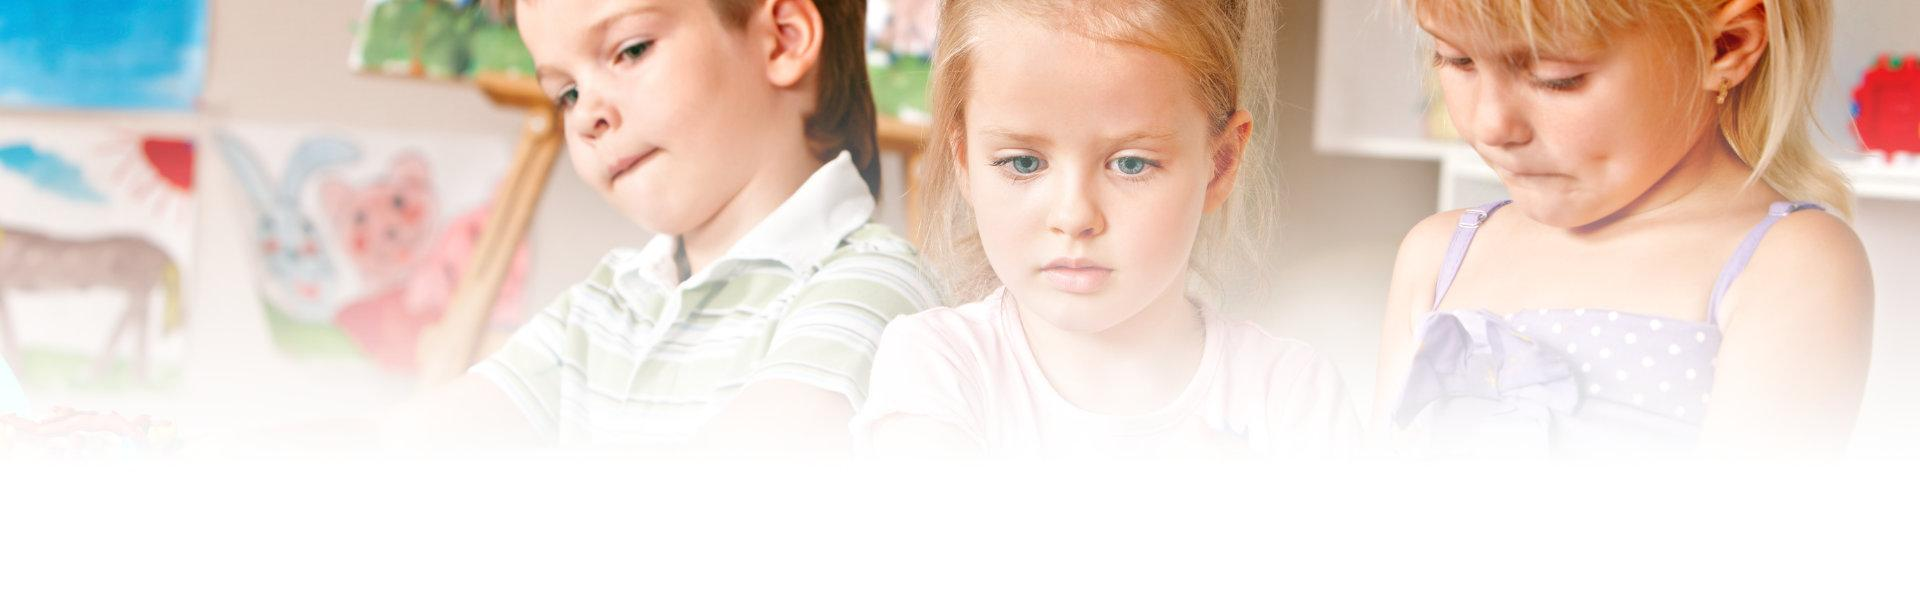 skupione dzieci